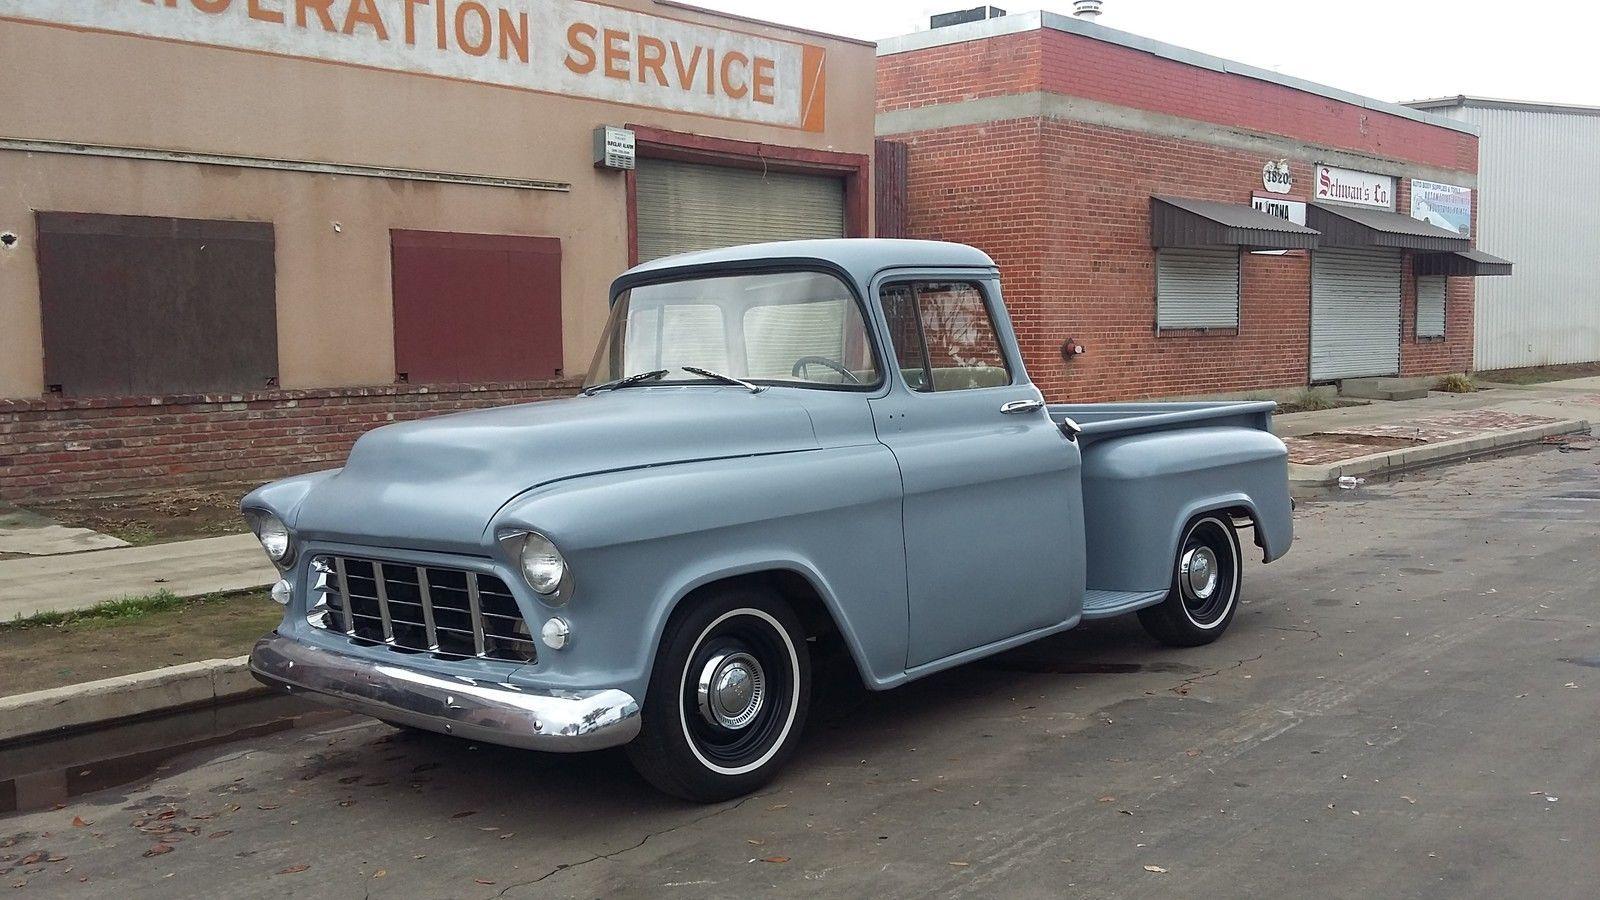 1955 chevrolet truck 3100 short bed big rear window